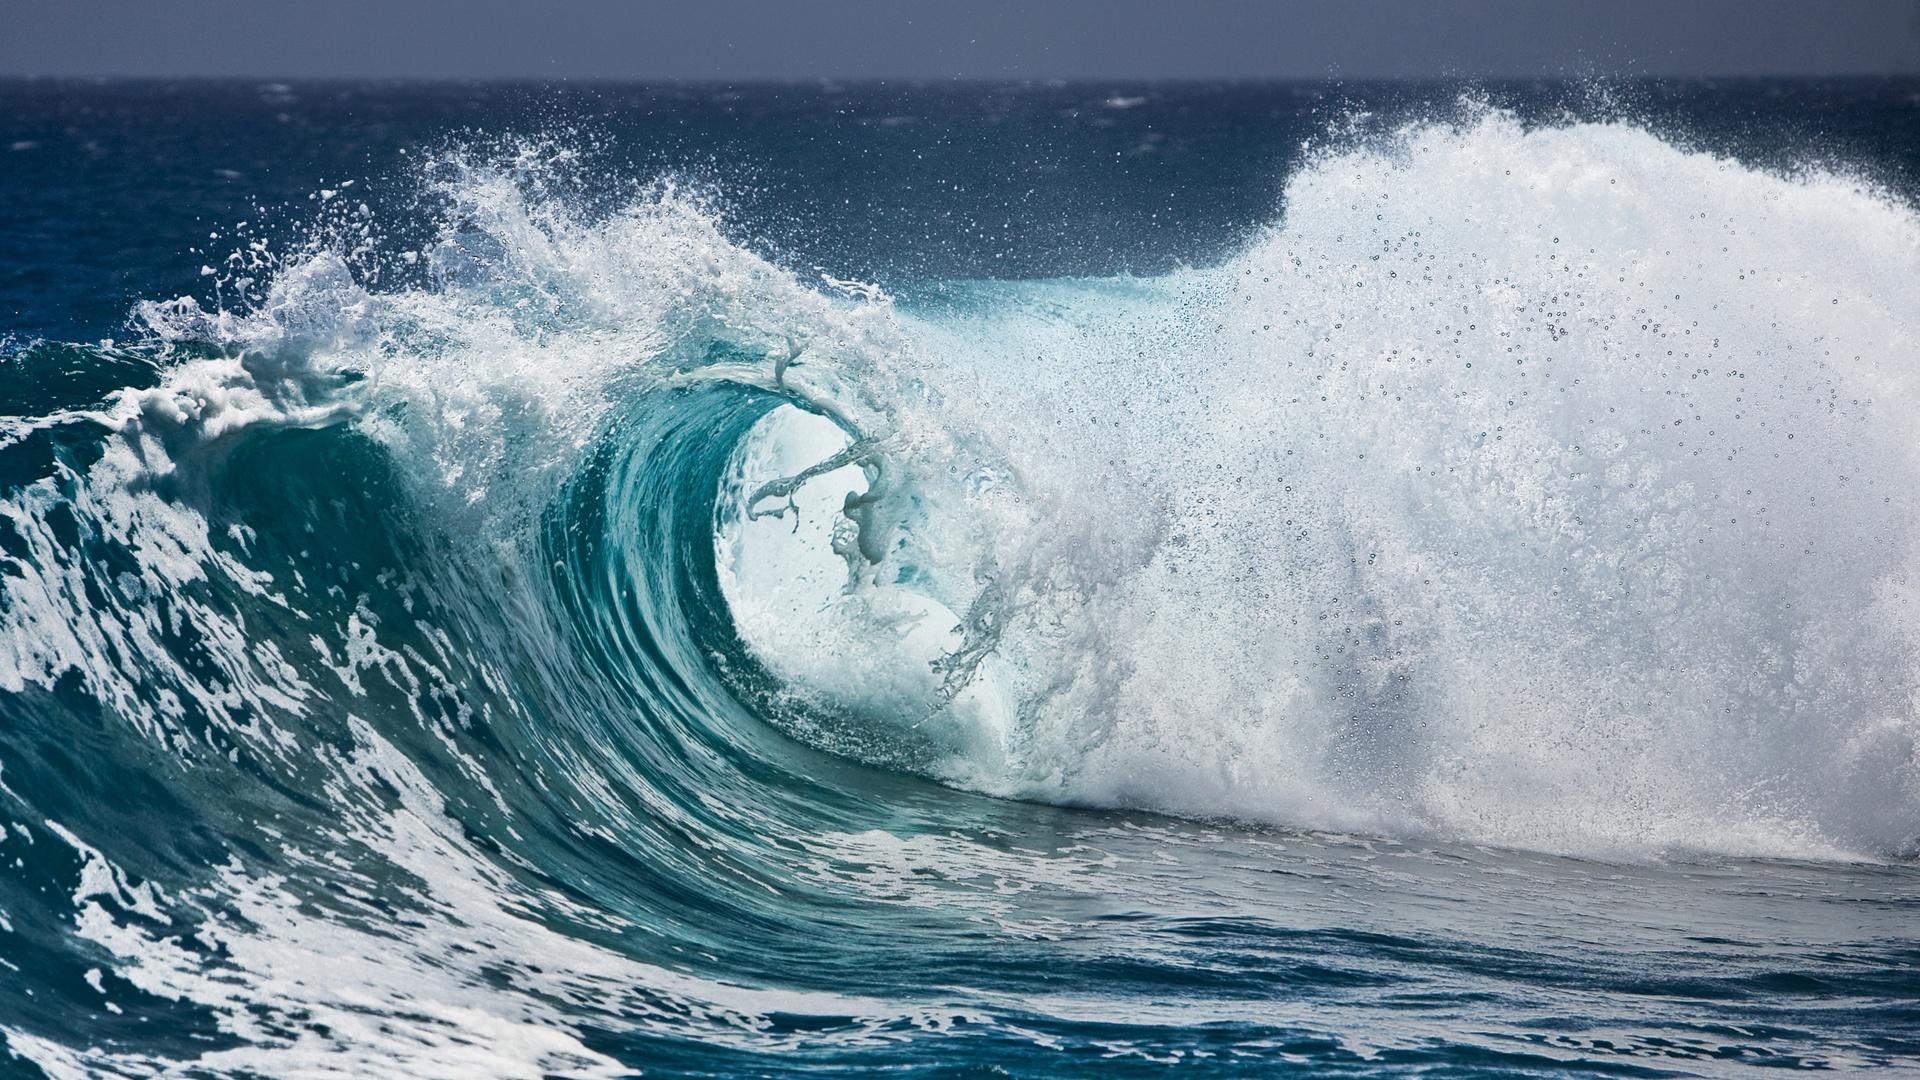 http://3.bp.blogspot.com/-f0OL-jbffW4/UOvB-rstXwI/AAAAAAAAUIA/TrfsQHZwWGM/s0/Choppy-waves-foam-spray-1920x1080.jpg